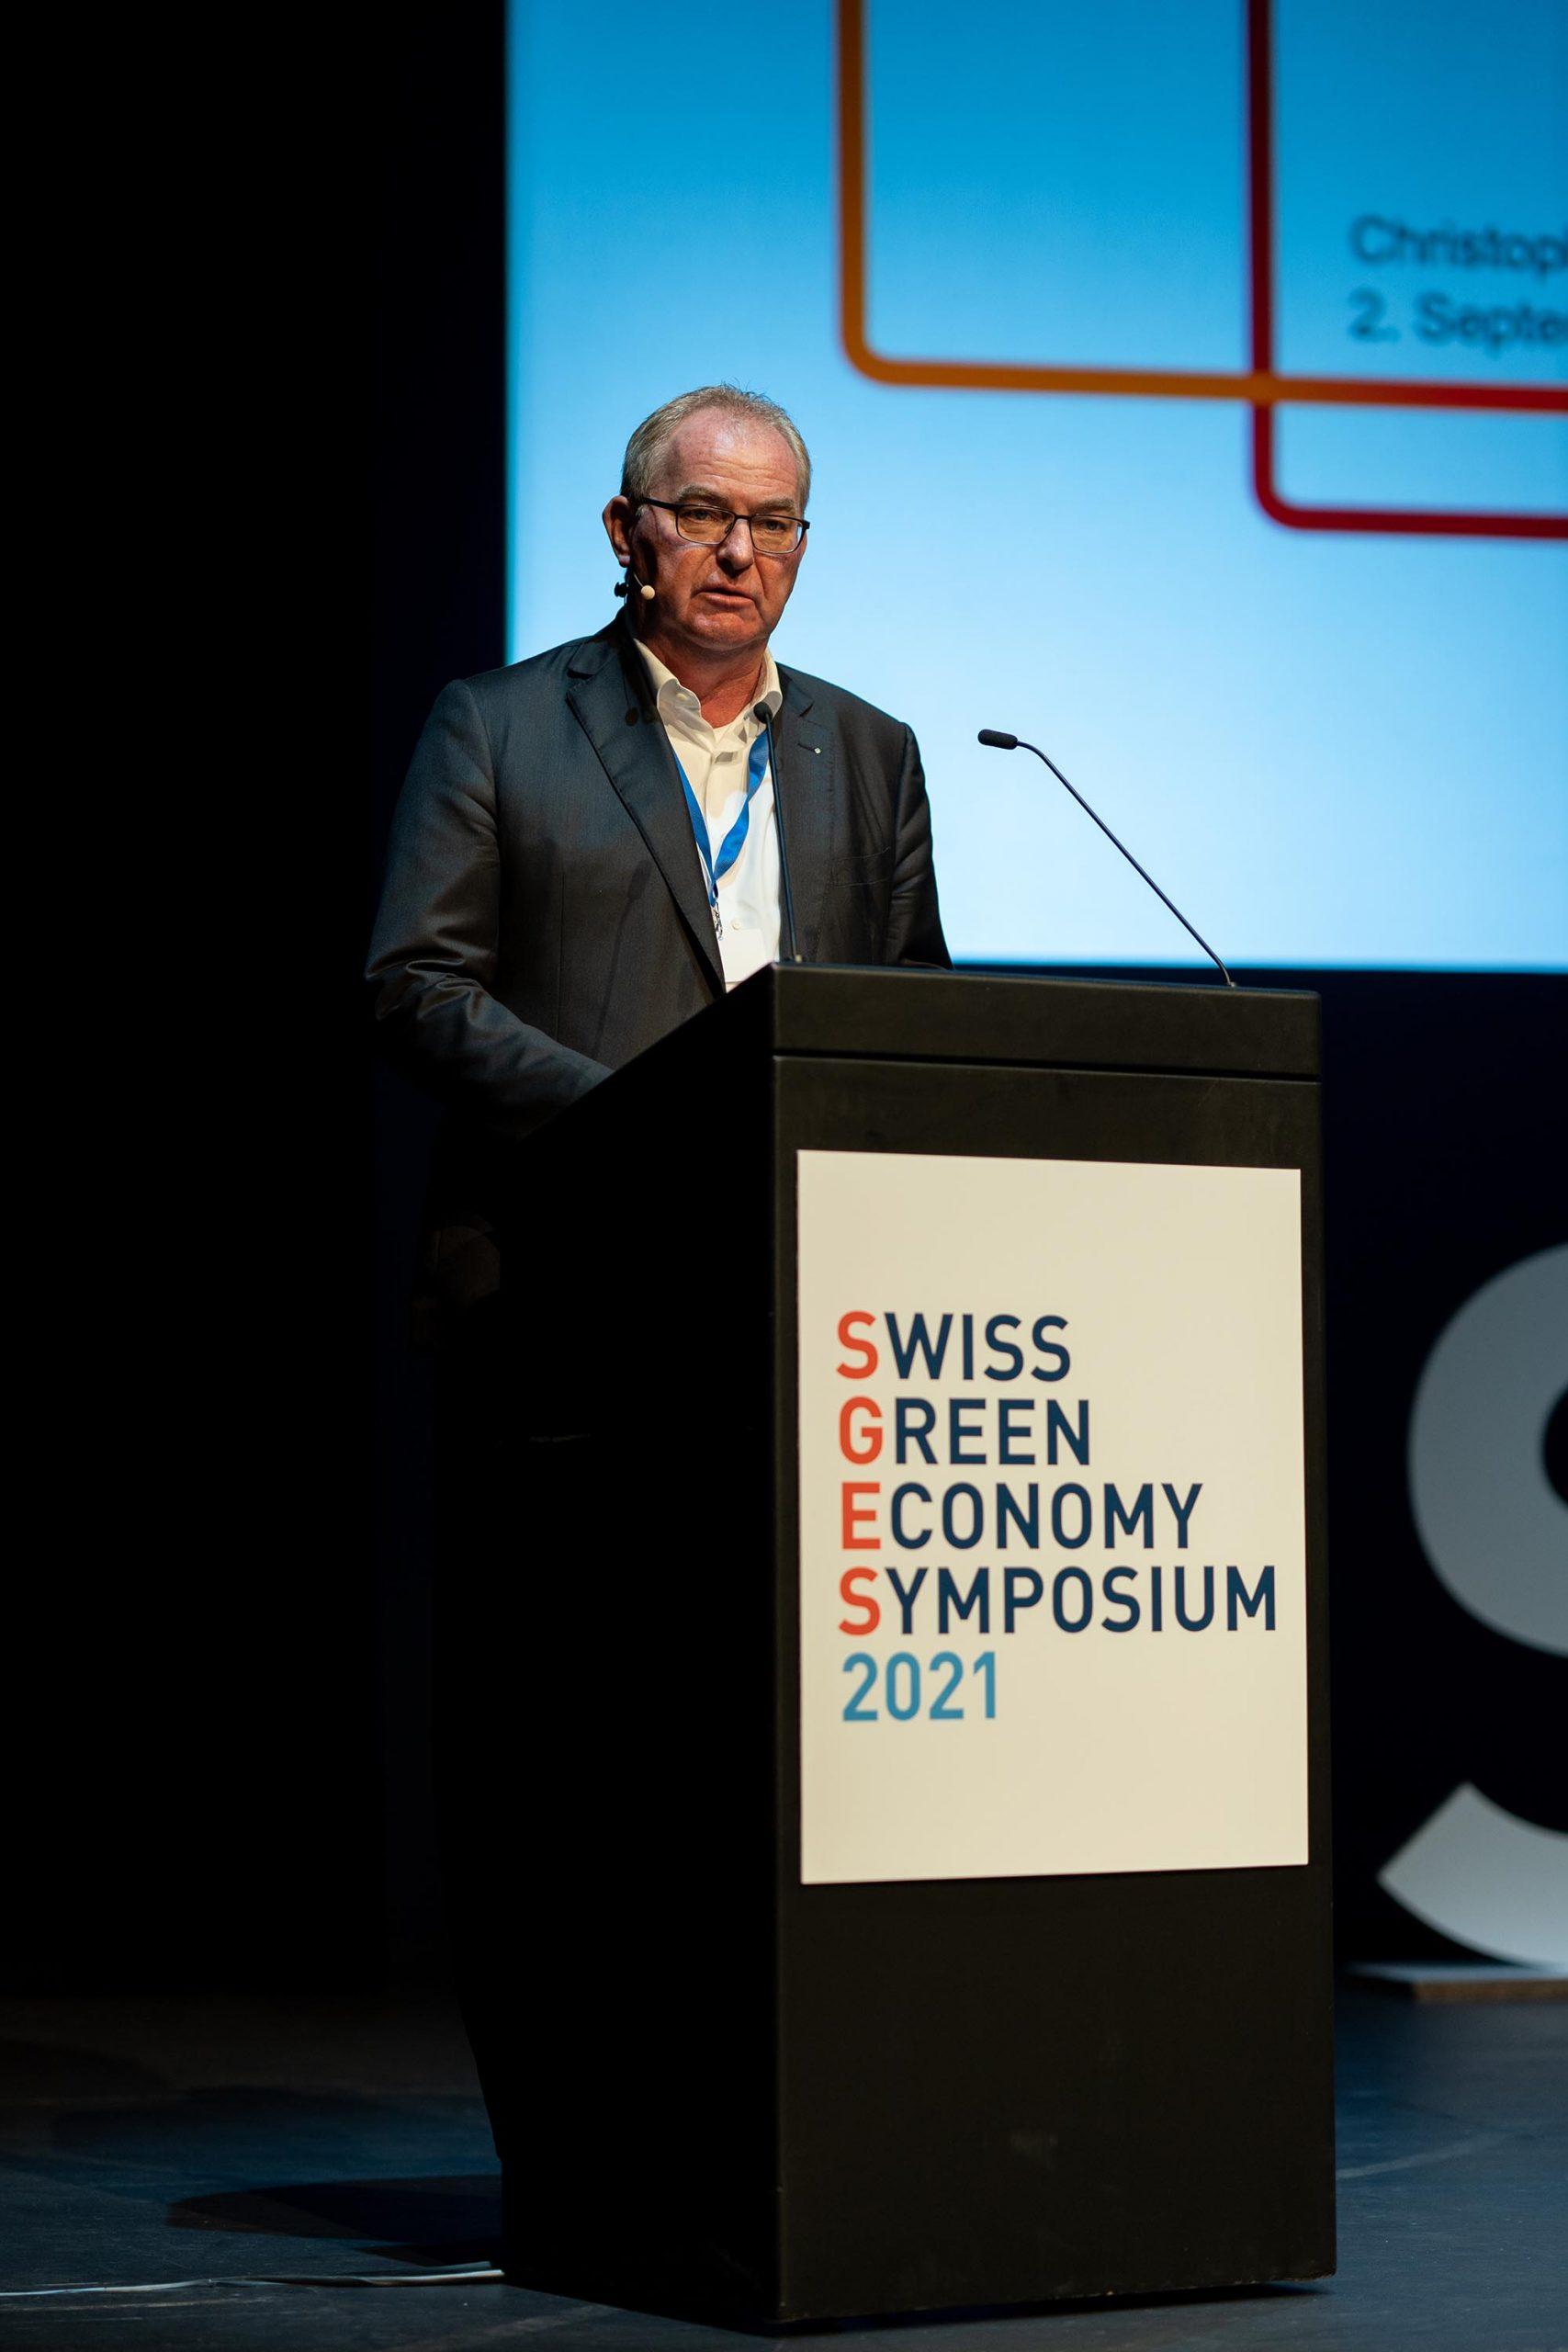 SGES Keynote: Christoph Mäder, Präsident, economiesuisse